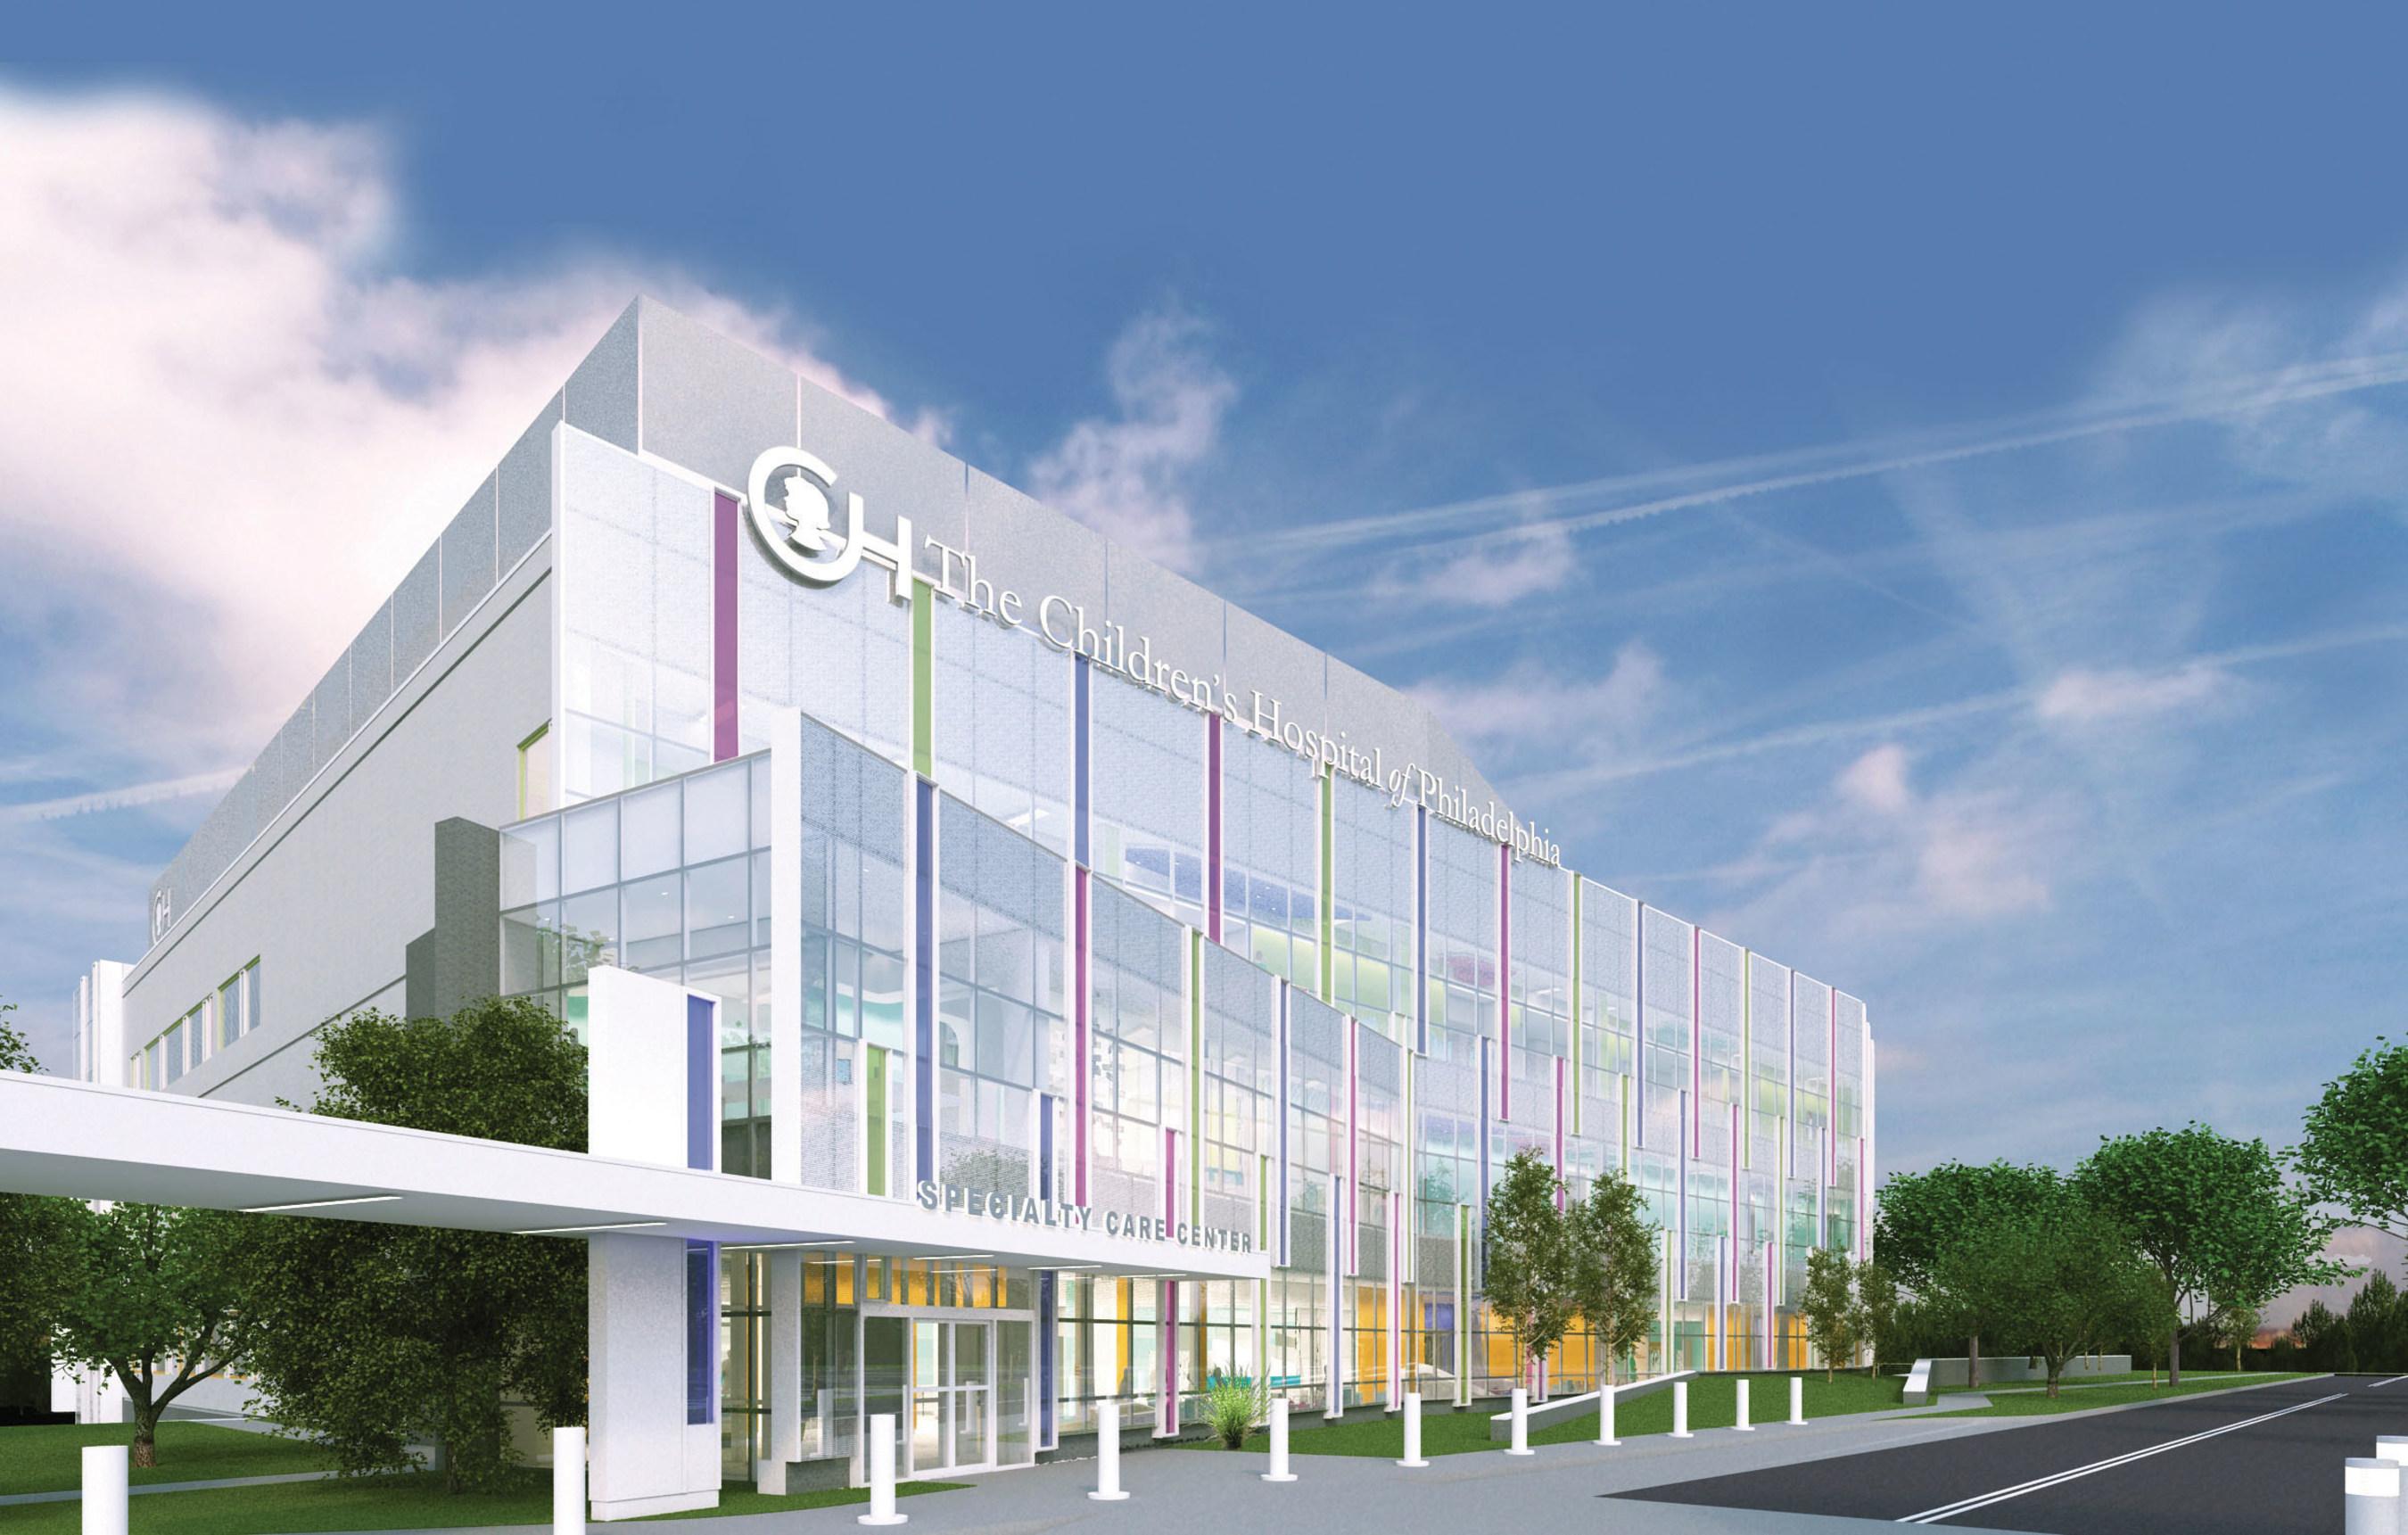 The Children's Hospital of Philadelphia Opens New Specialty